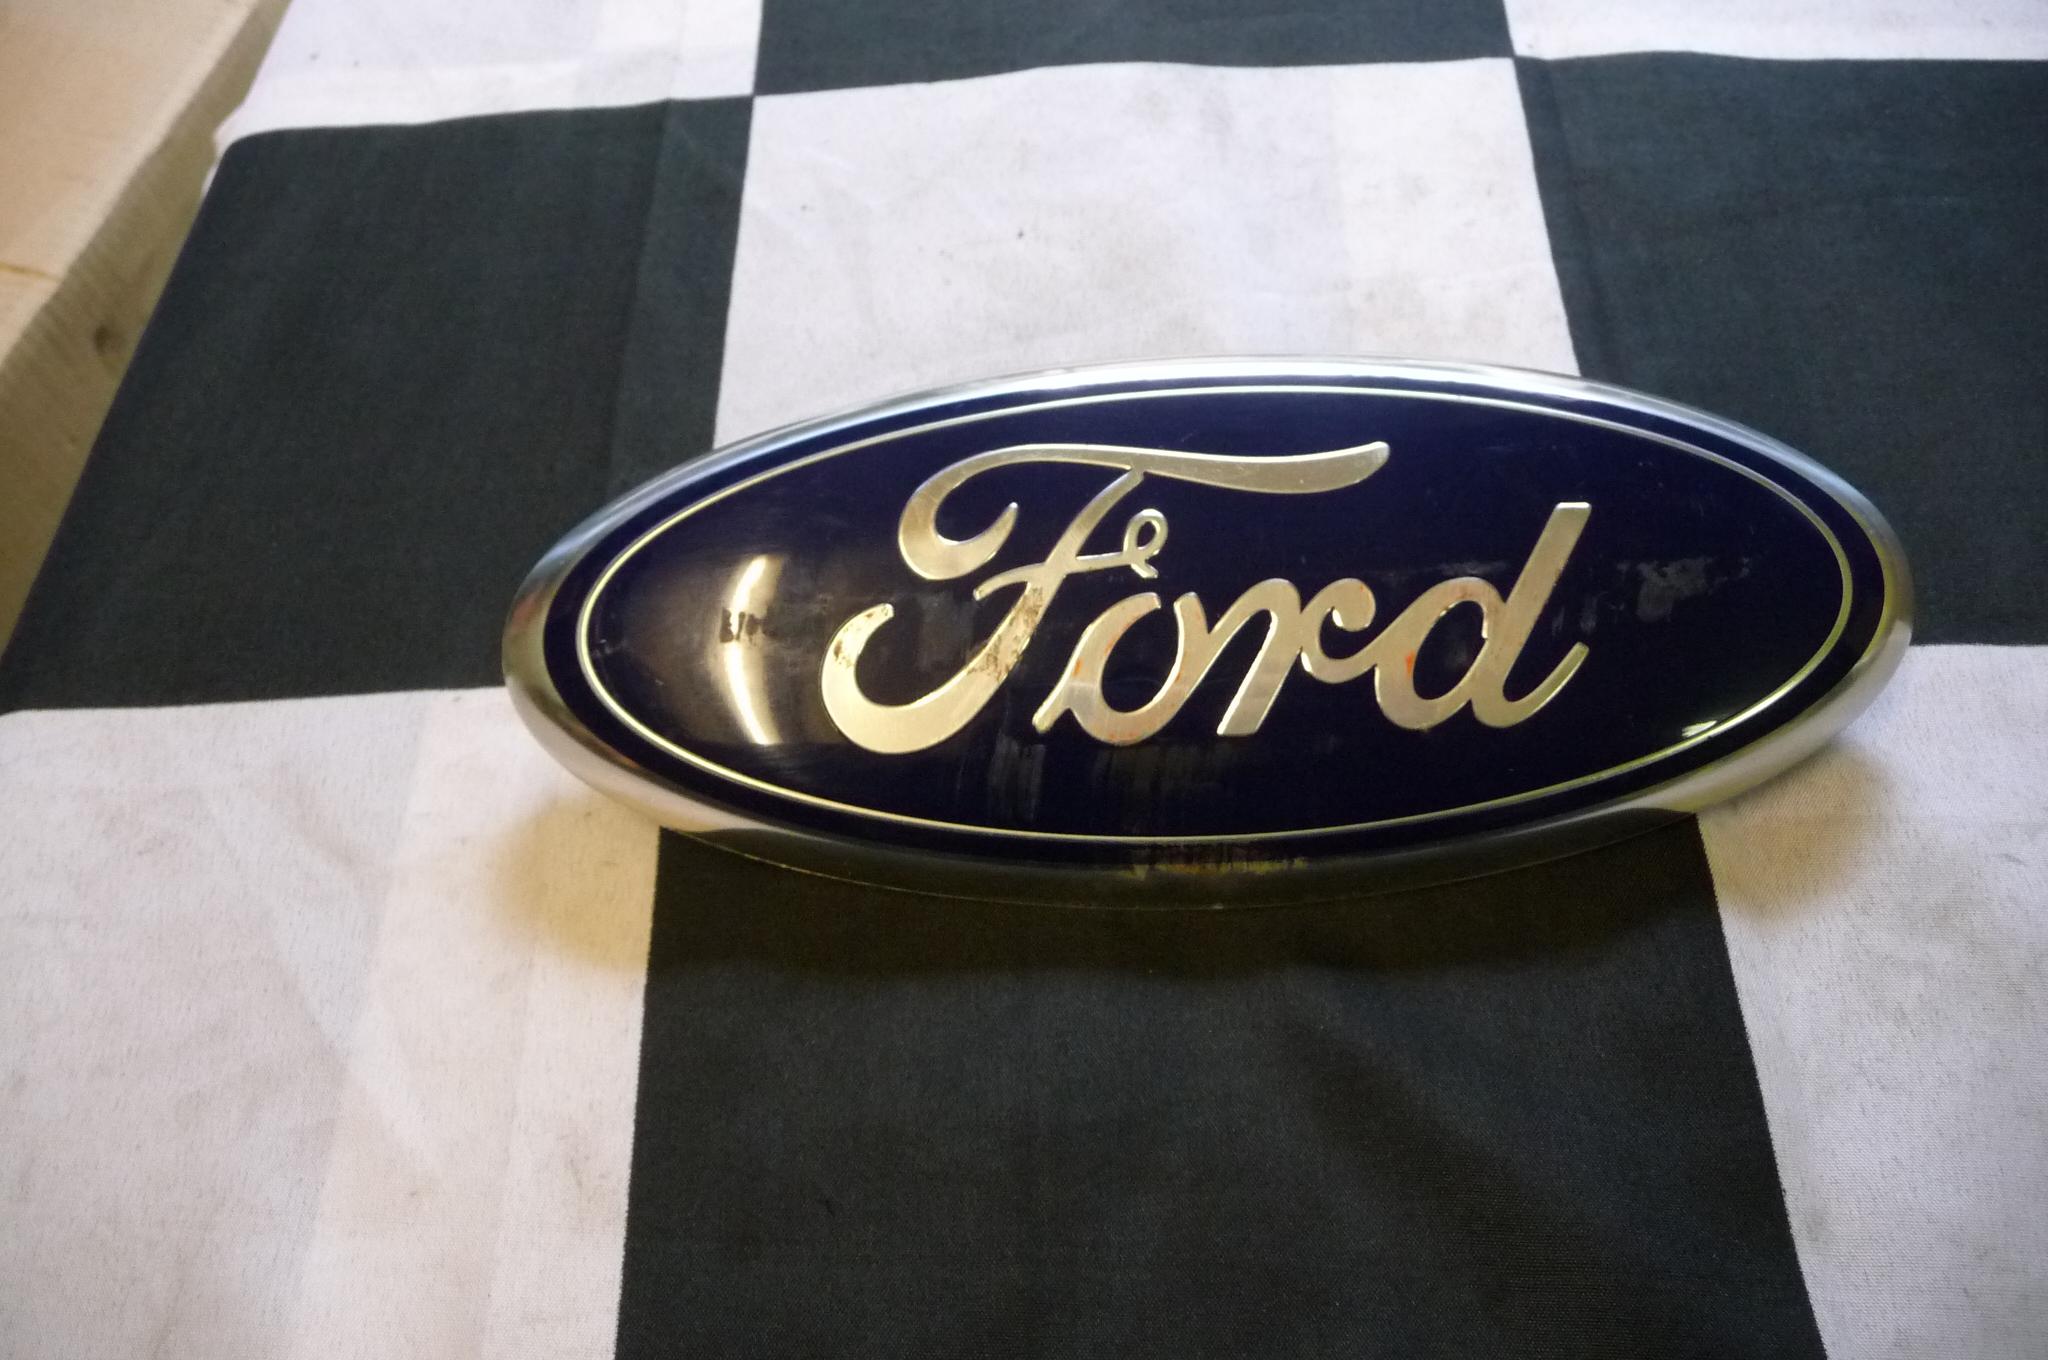 Ford Edge Flex Taurus X Front Grill Emblem Logo Badge Sign Nameplate Btz